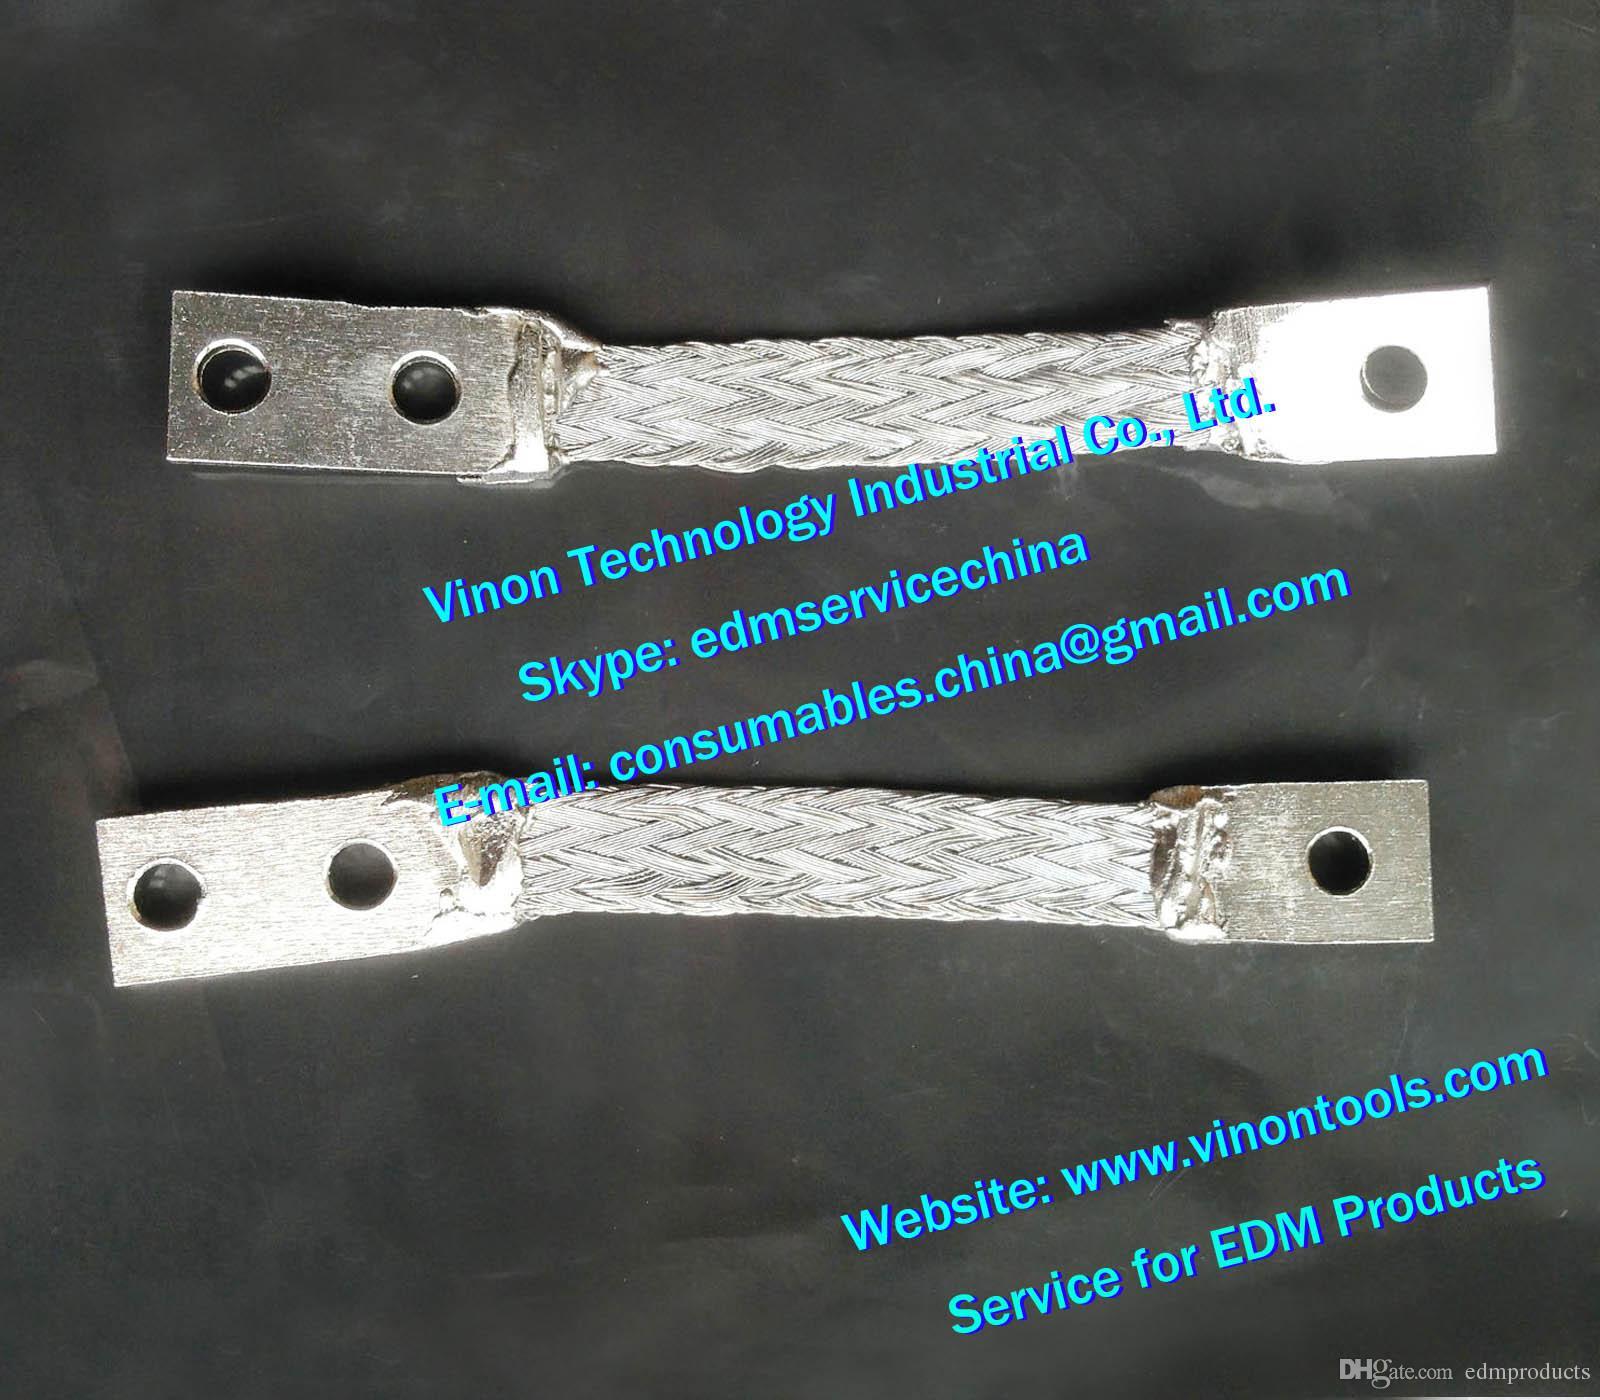 (2 adet) 100446736 edm Toprak kablosu kontak fırçası C301 L = 71mm, Alt Kontak Mesh 100.446.736, 446.736, 24.54.110 ROBOFIL 190,290,300 için